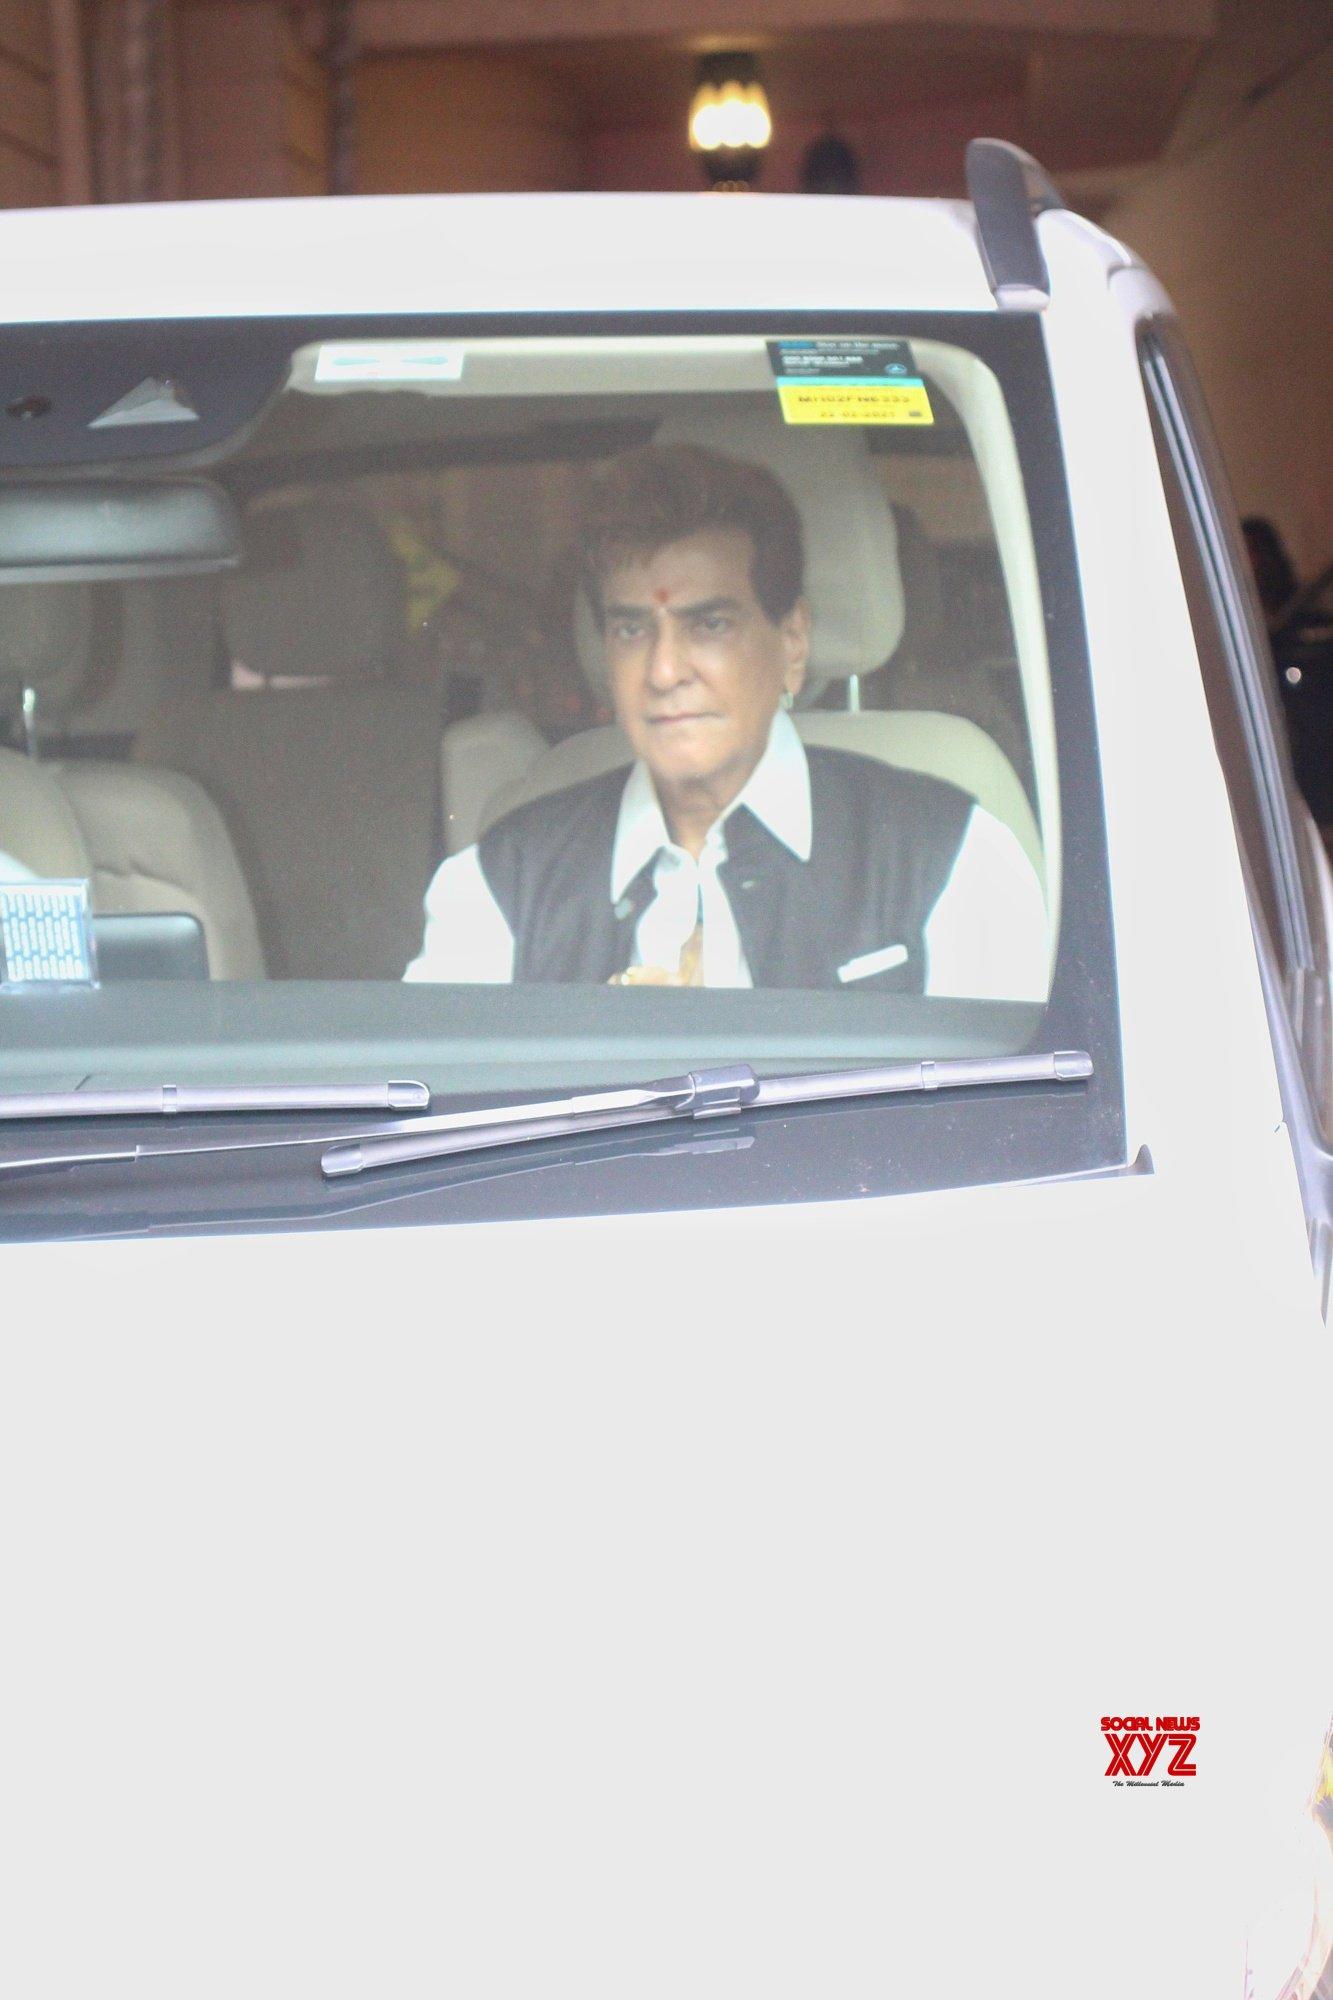 Jeetendra And Tusshar Kapoor Spotted At Ekta Kapoor Residence For Ganpati Visarjan In Juhu - Gallery